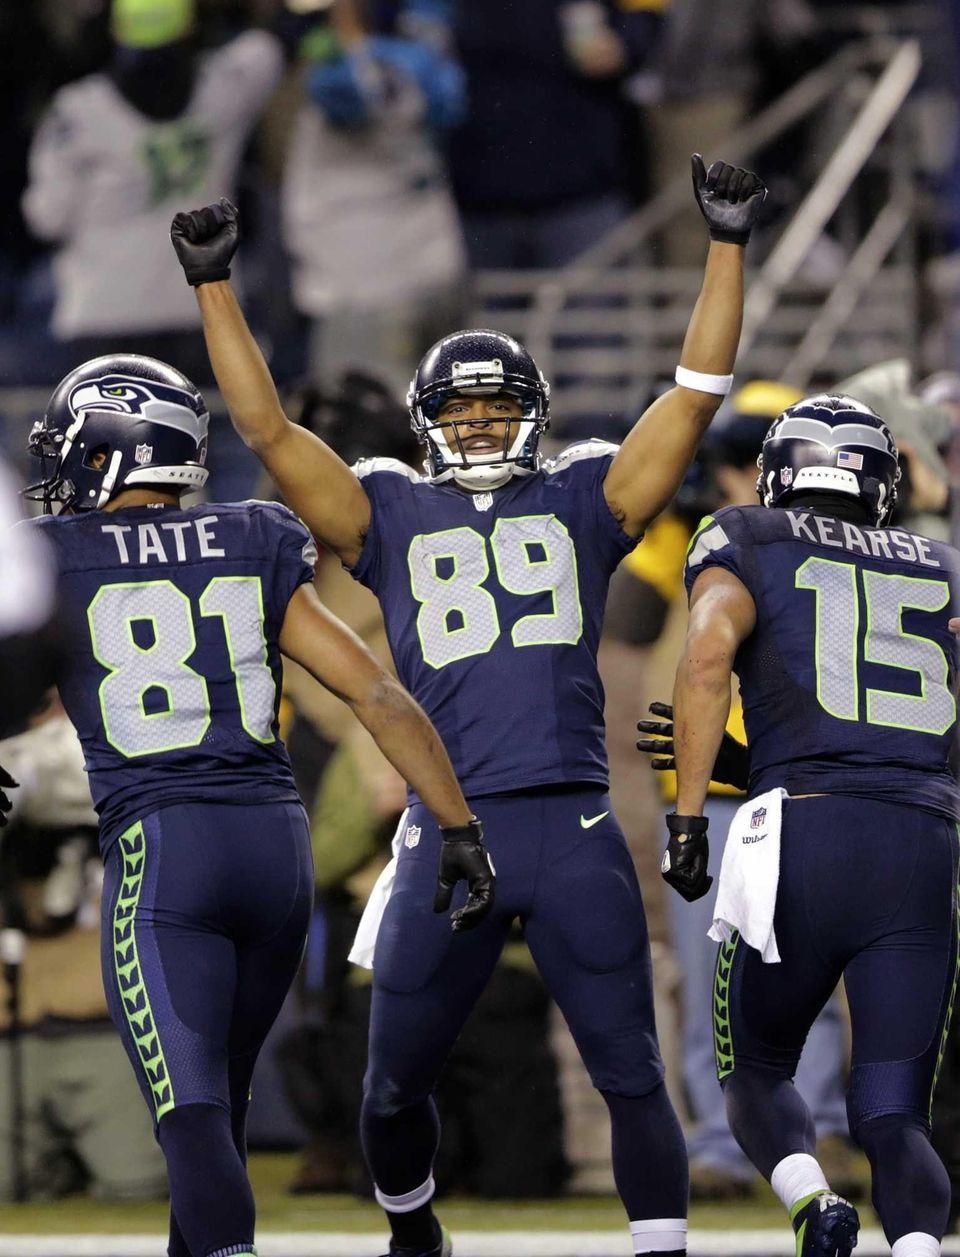 Seattle Seahawks wide receiver Doug Baldwin celebrates after